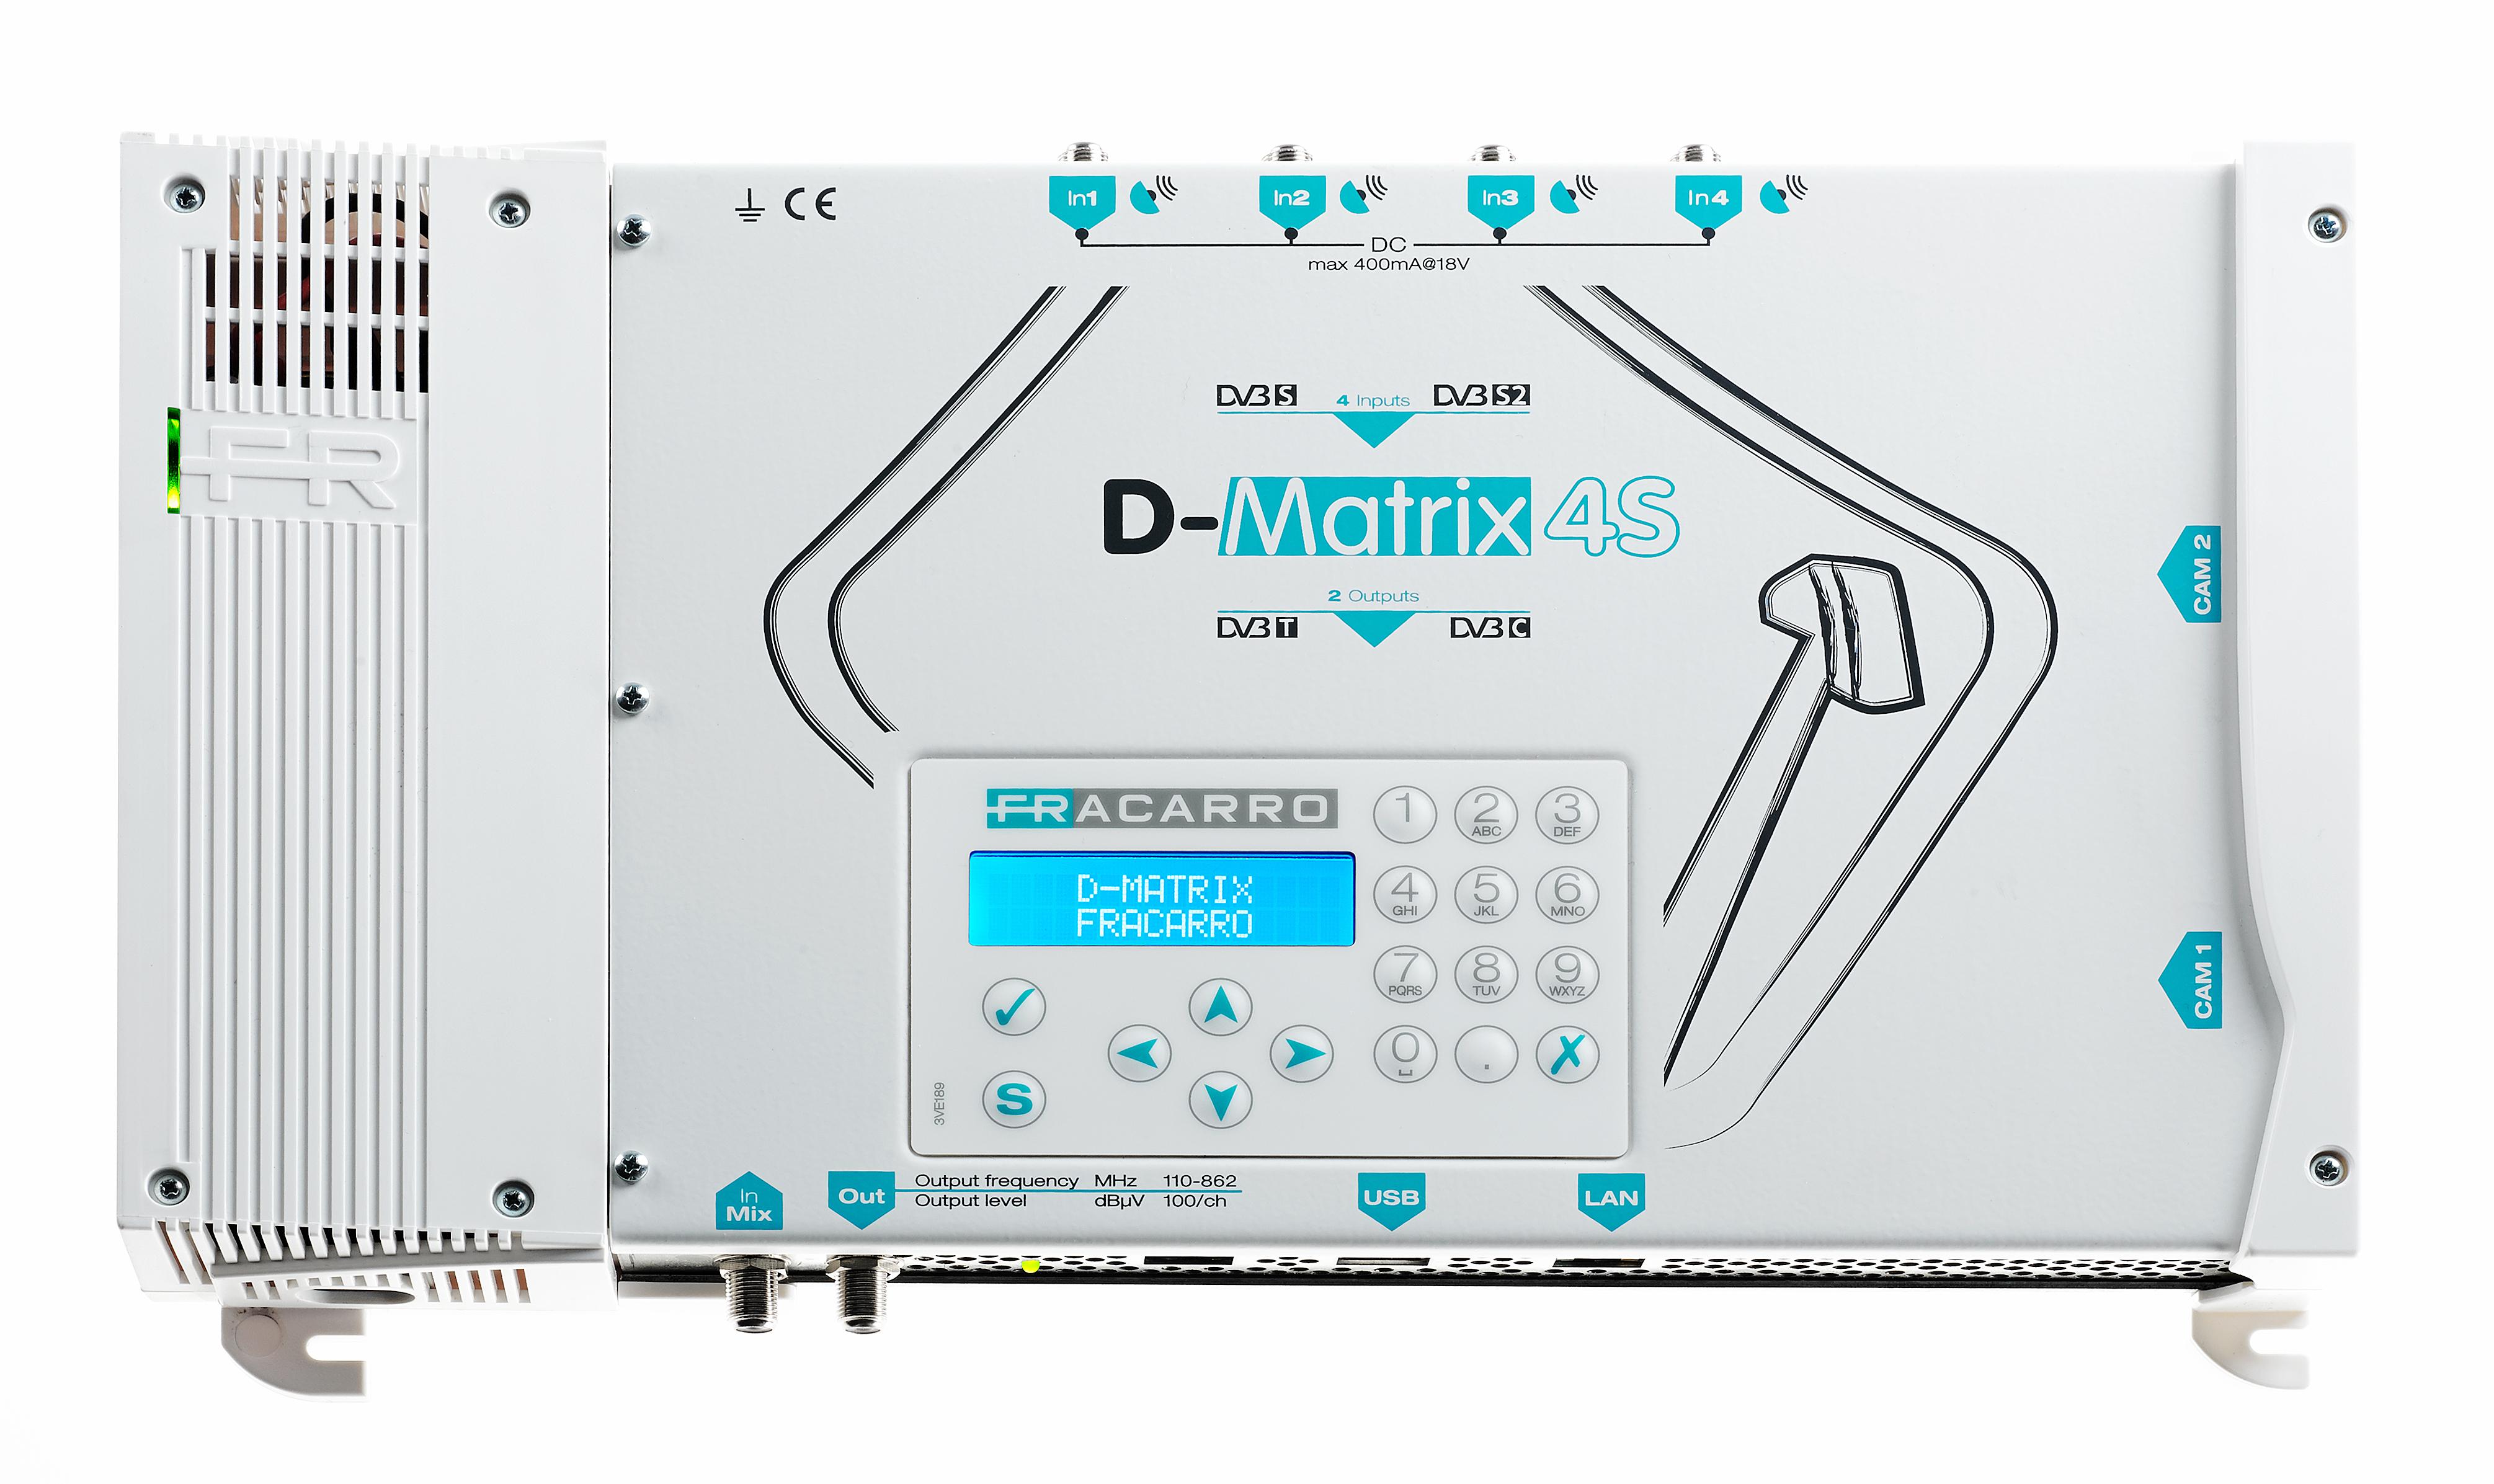 Trasmodulatore DVB-S DVB-T D-Matrix-4S 2 Slot CI Programmabile